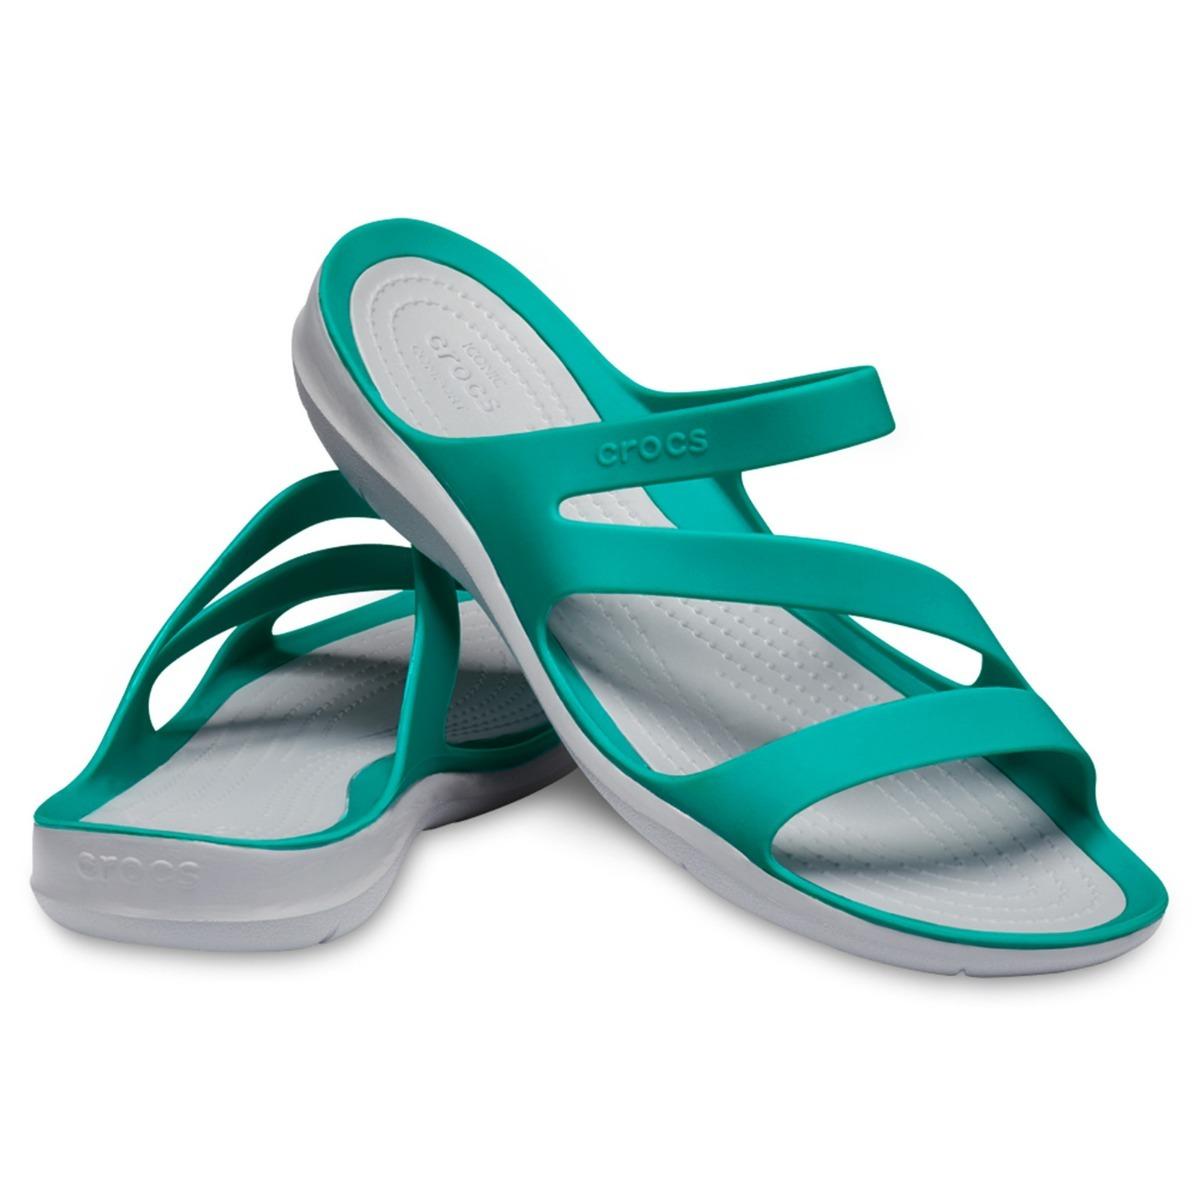 936efe01e43 crocs sandalia swifwater sandal w tropical teal light grey. Cargando zoom.